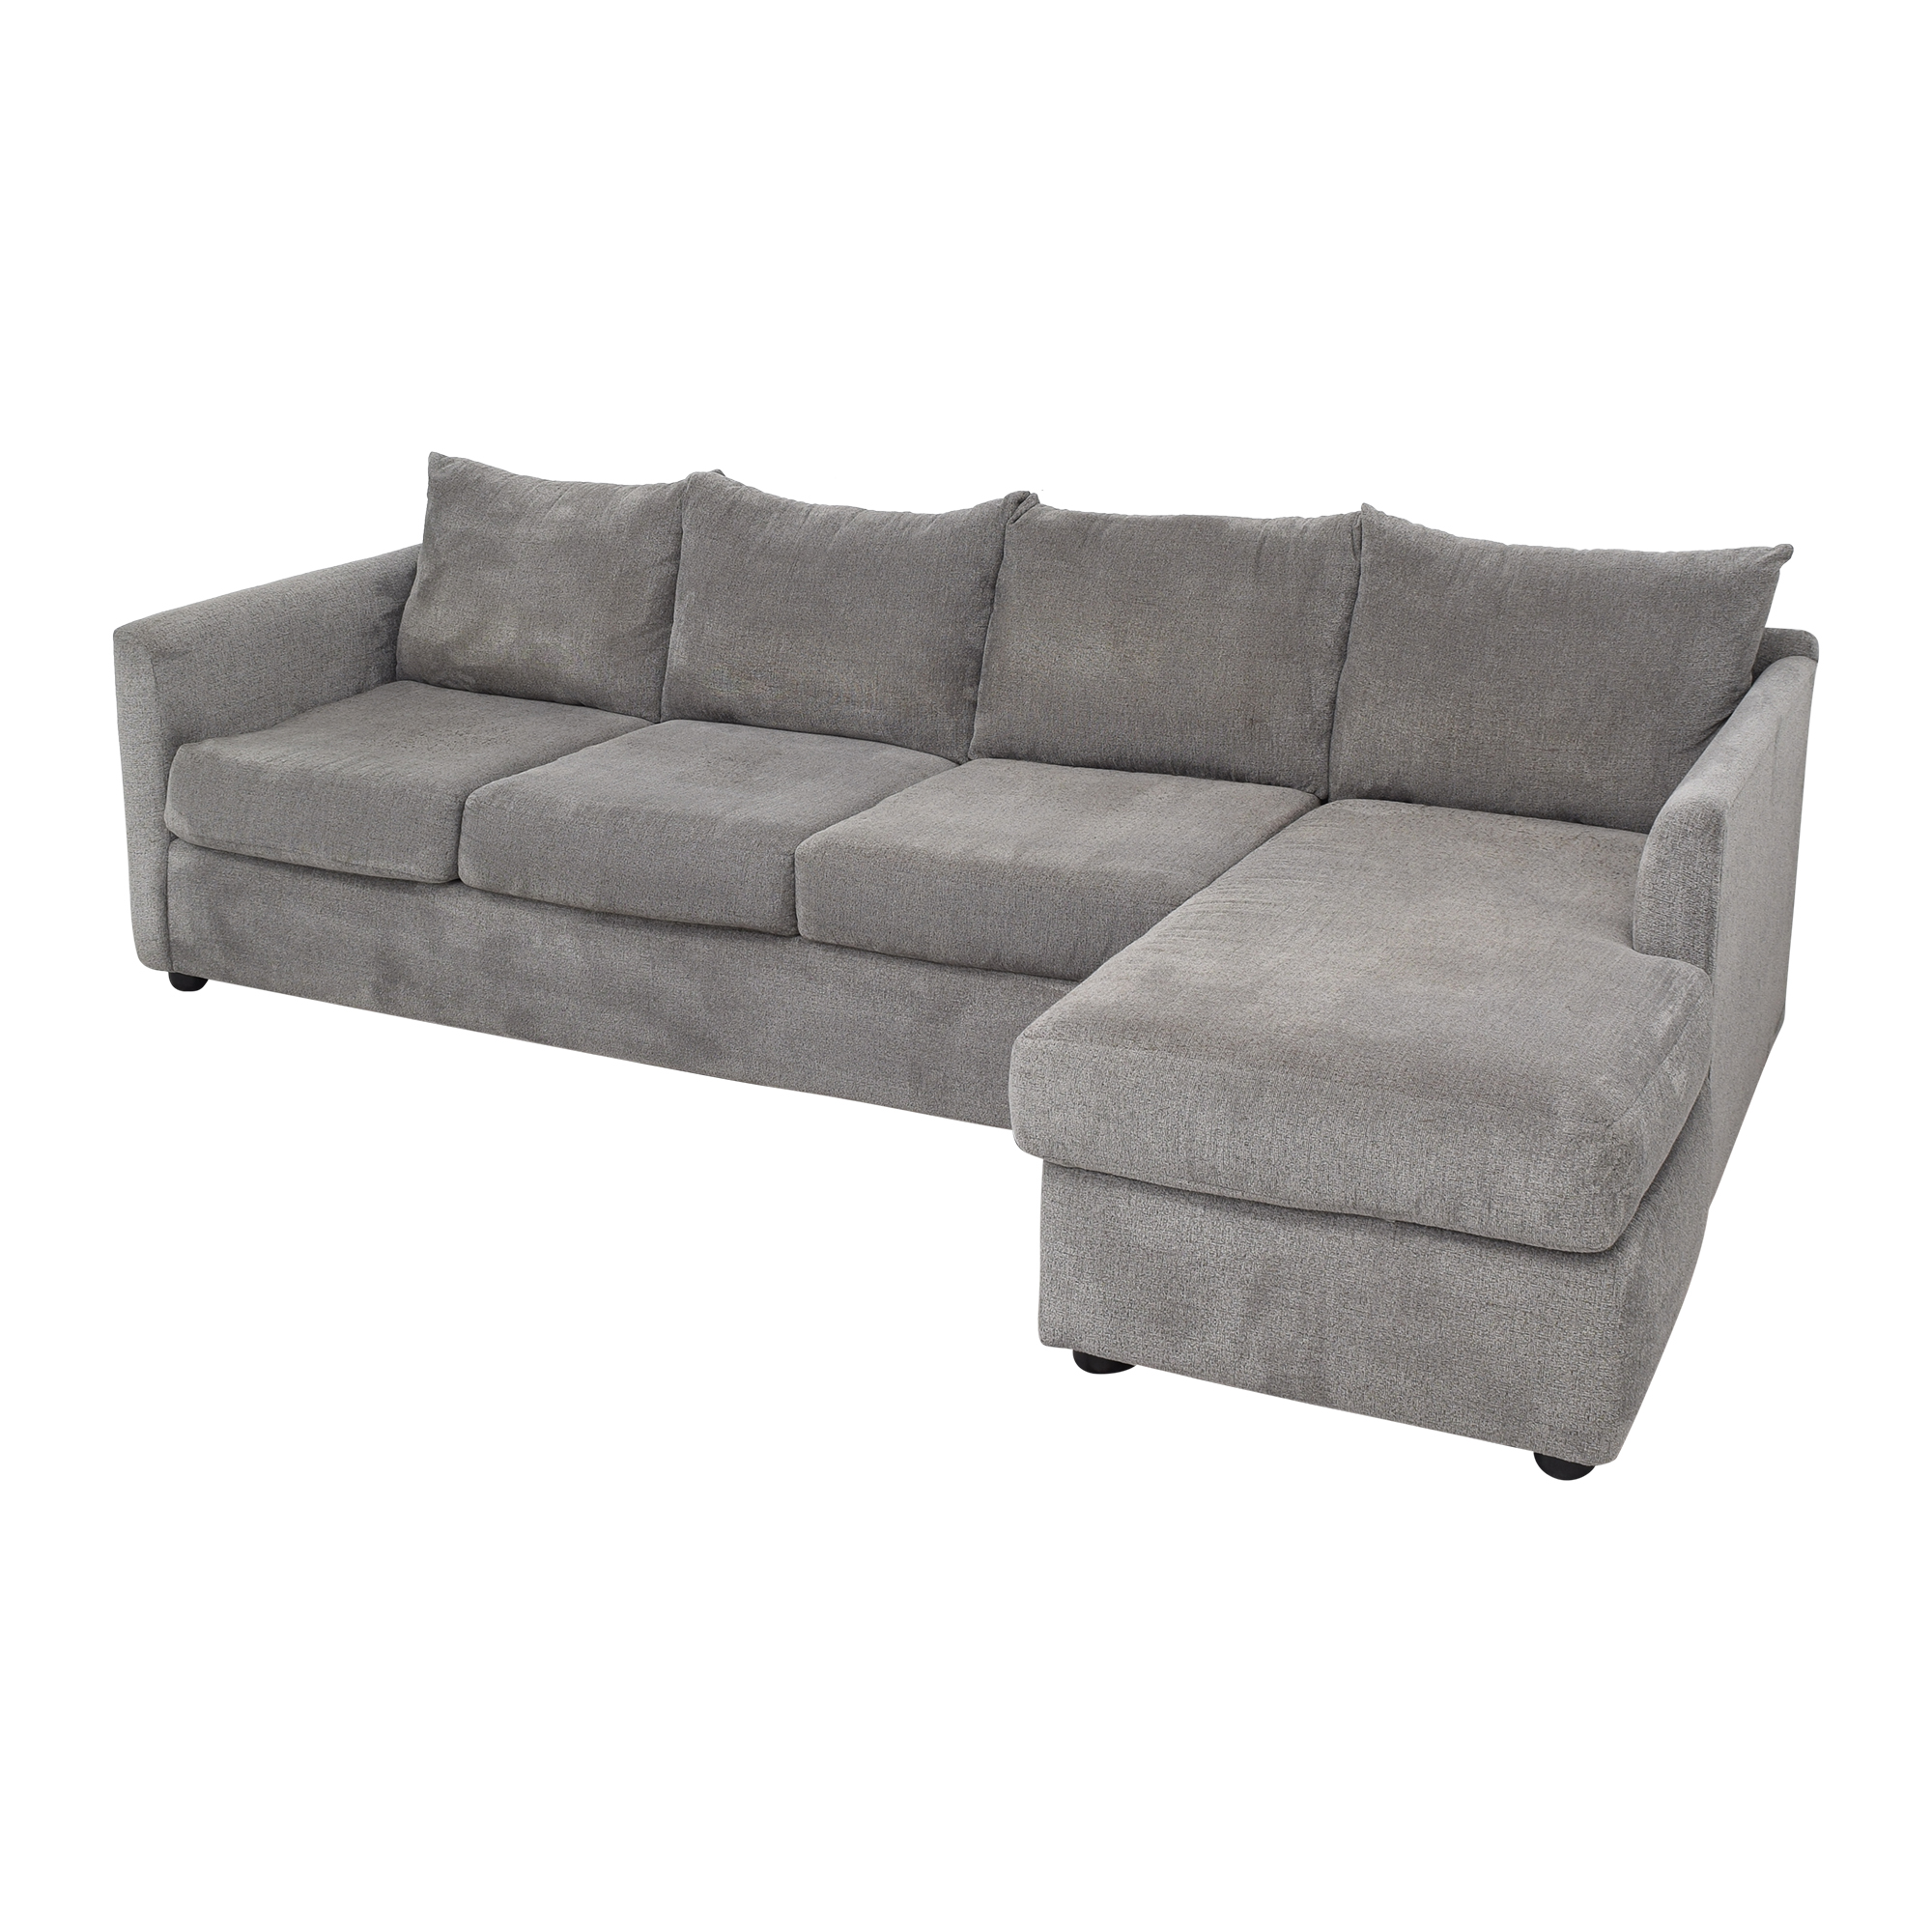 buy KFI Sectional Chaise Sofa KFI